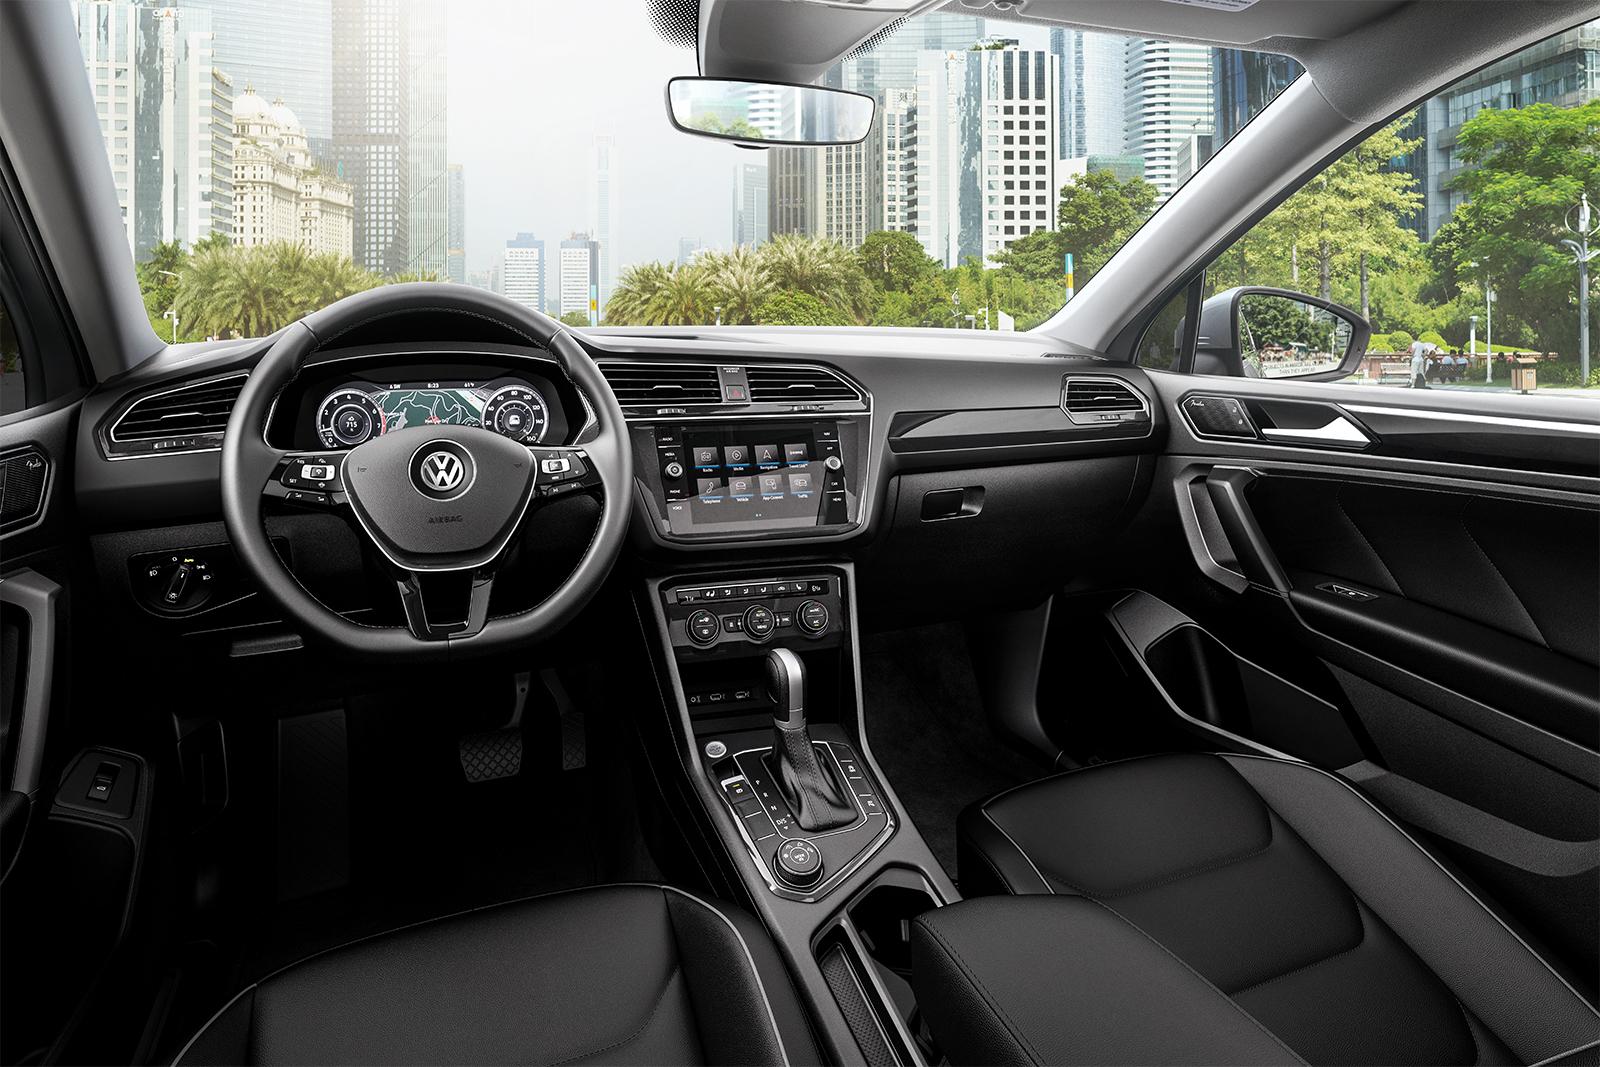 2019 Volkswagen Tiguan Review, Configurations, Price | Ann